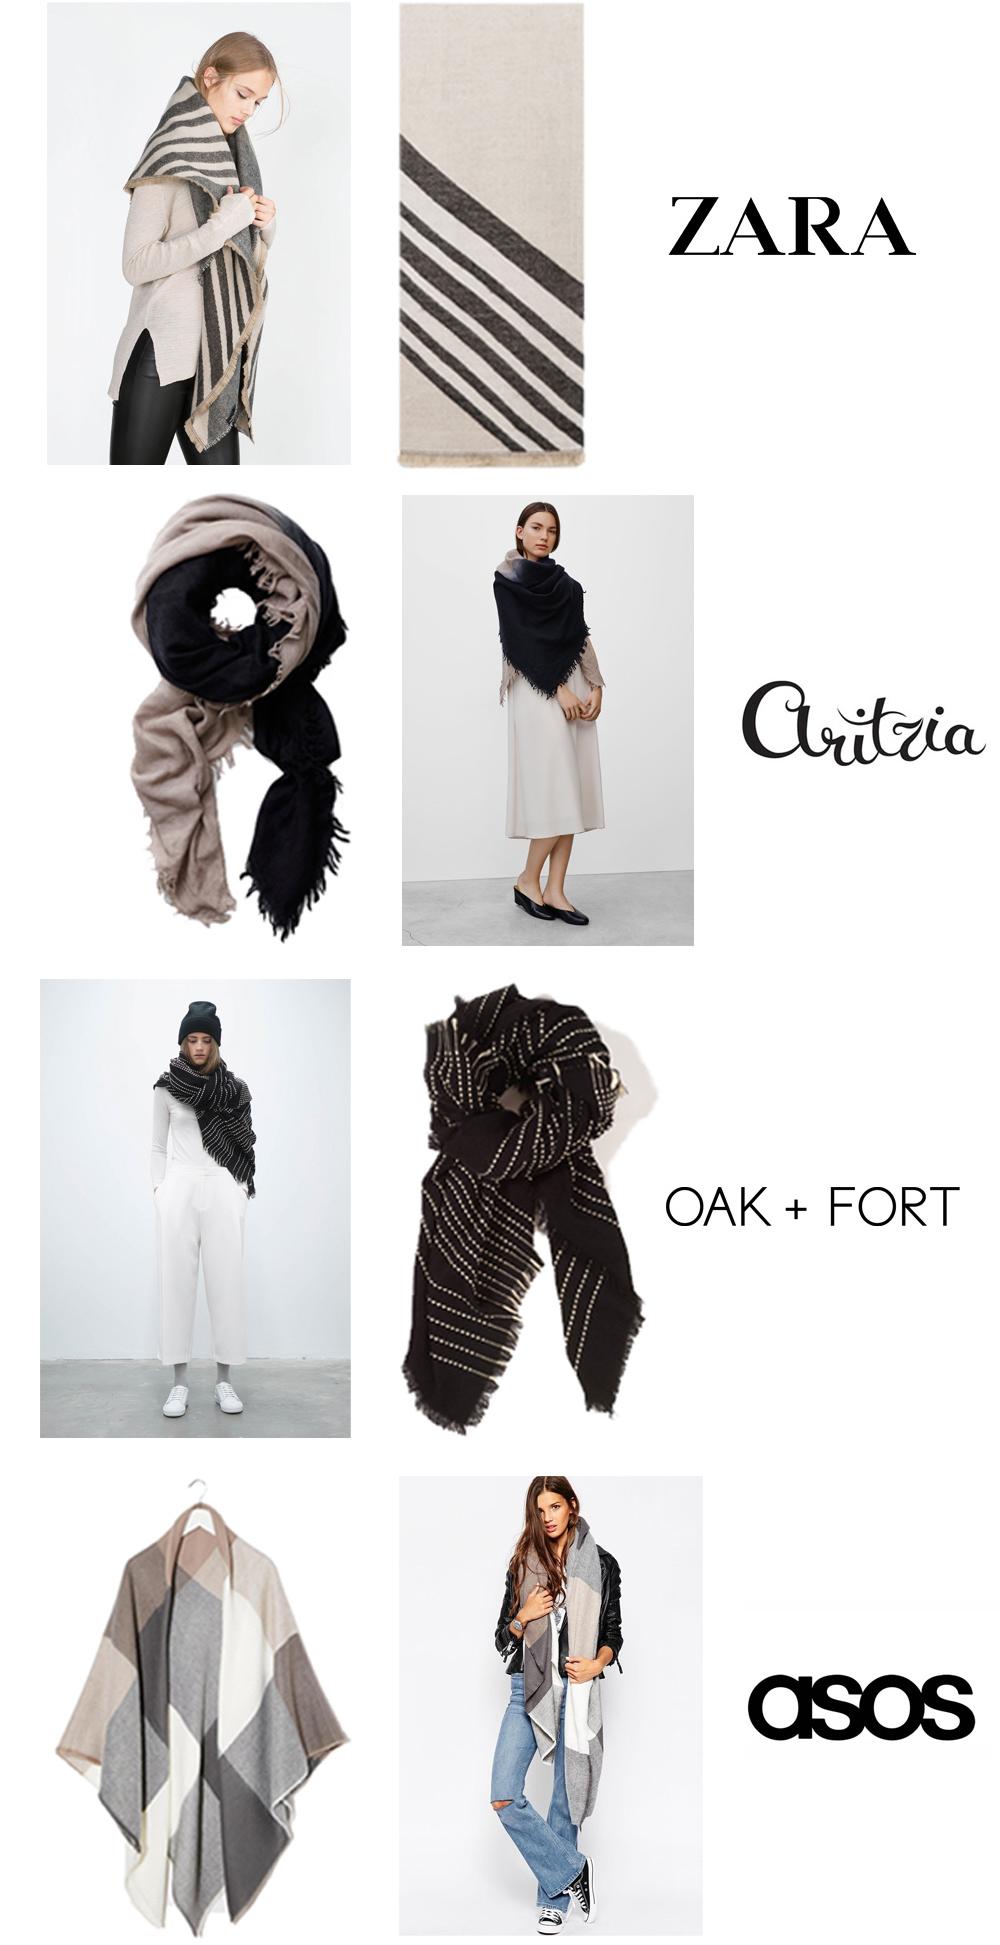 "- Zara soft geometric scarf {$40 / 51 x 55"" /100% acrylic} - Aritzia gloomy days blanket scarf {$85 / 51 x 63"" /100% wool} - Oak & Fort blanket scarf {$48 / 62 x 62"" /100% acrylic} - asos oversized square scarf {$40 / 59 x 59"" /100% acrylic}"